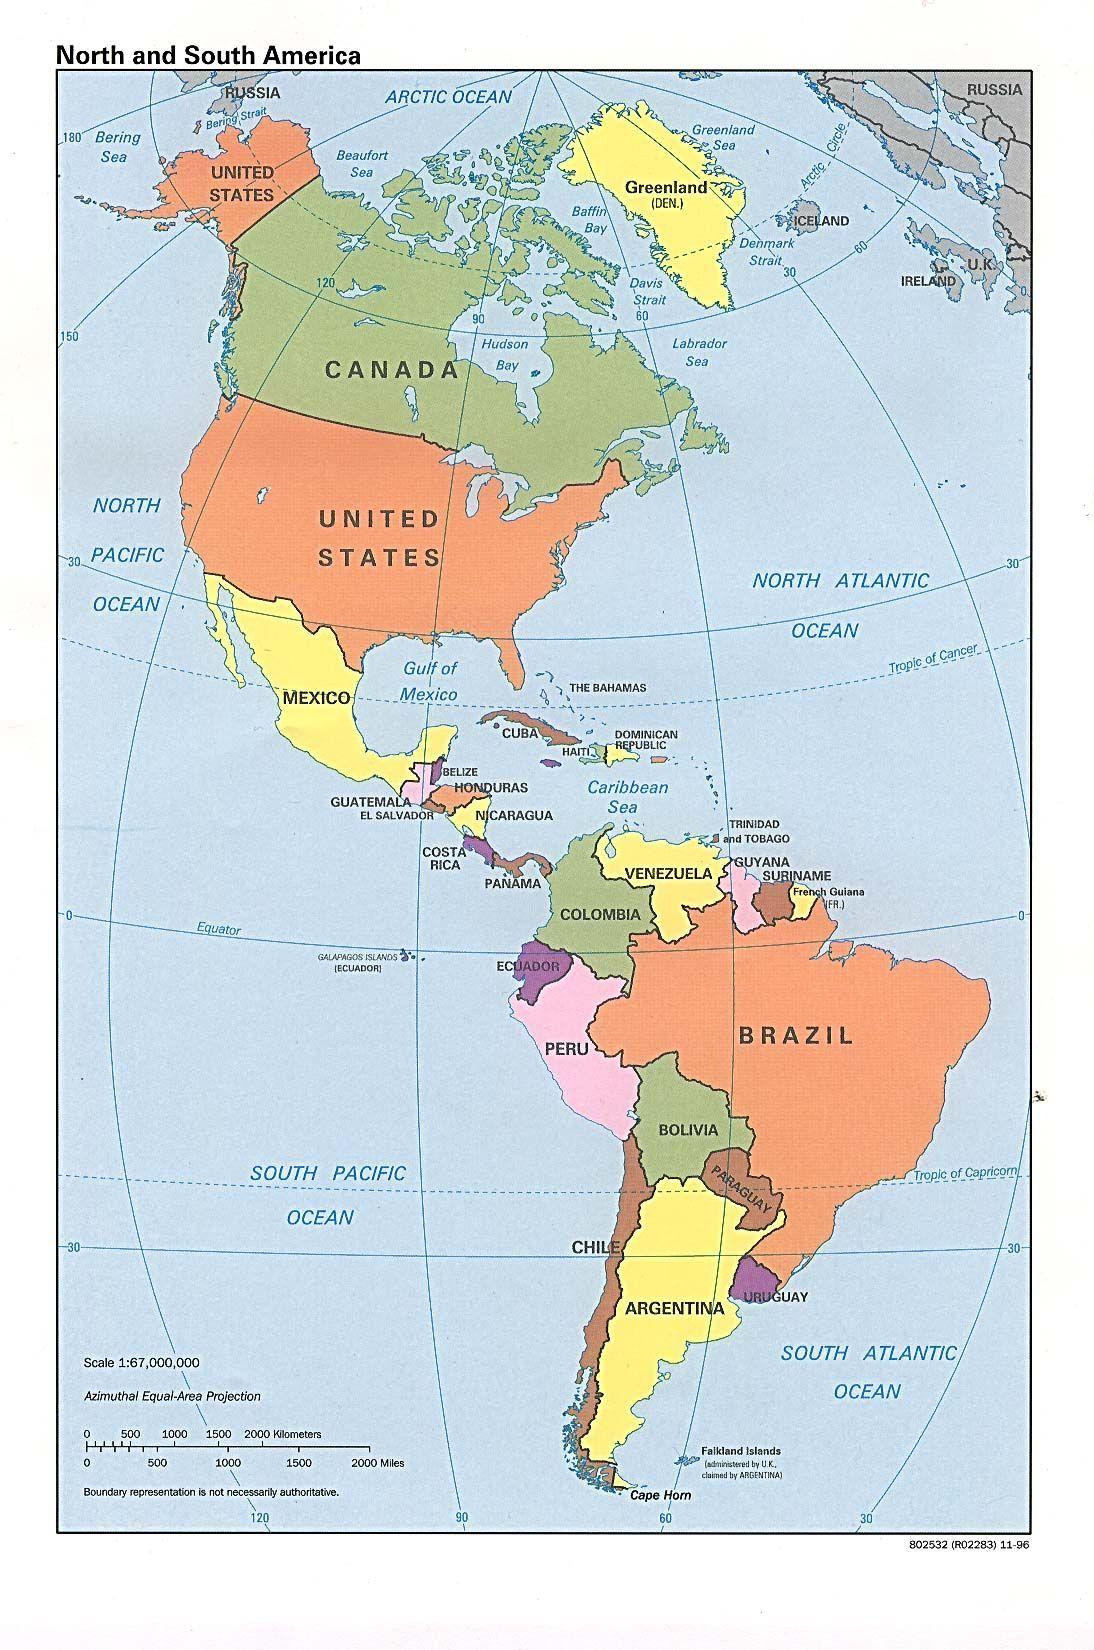 Mapa Fisico Politic Del Continente Americano Buscar Con Google Mapa De America Mapas Geograficos Mapa Politico